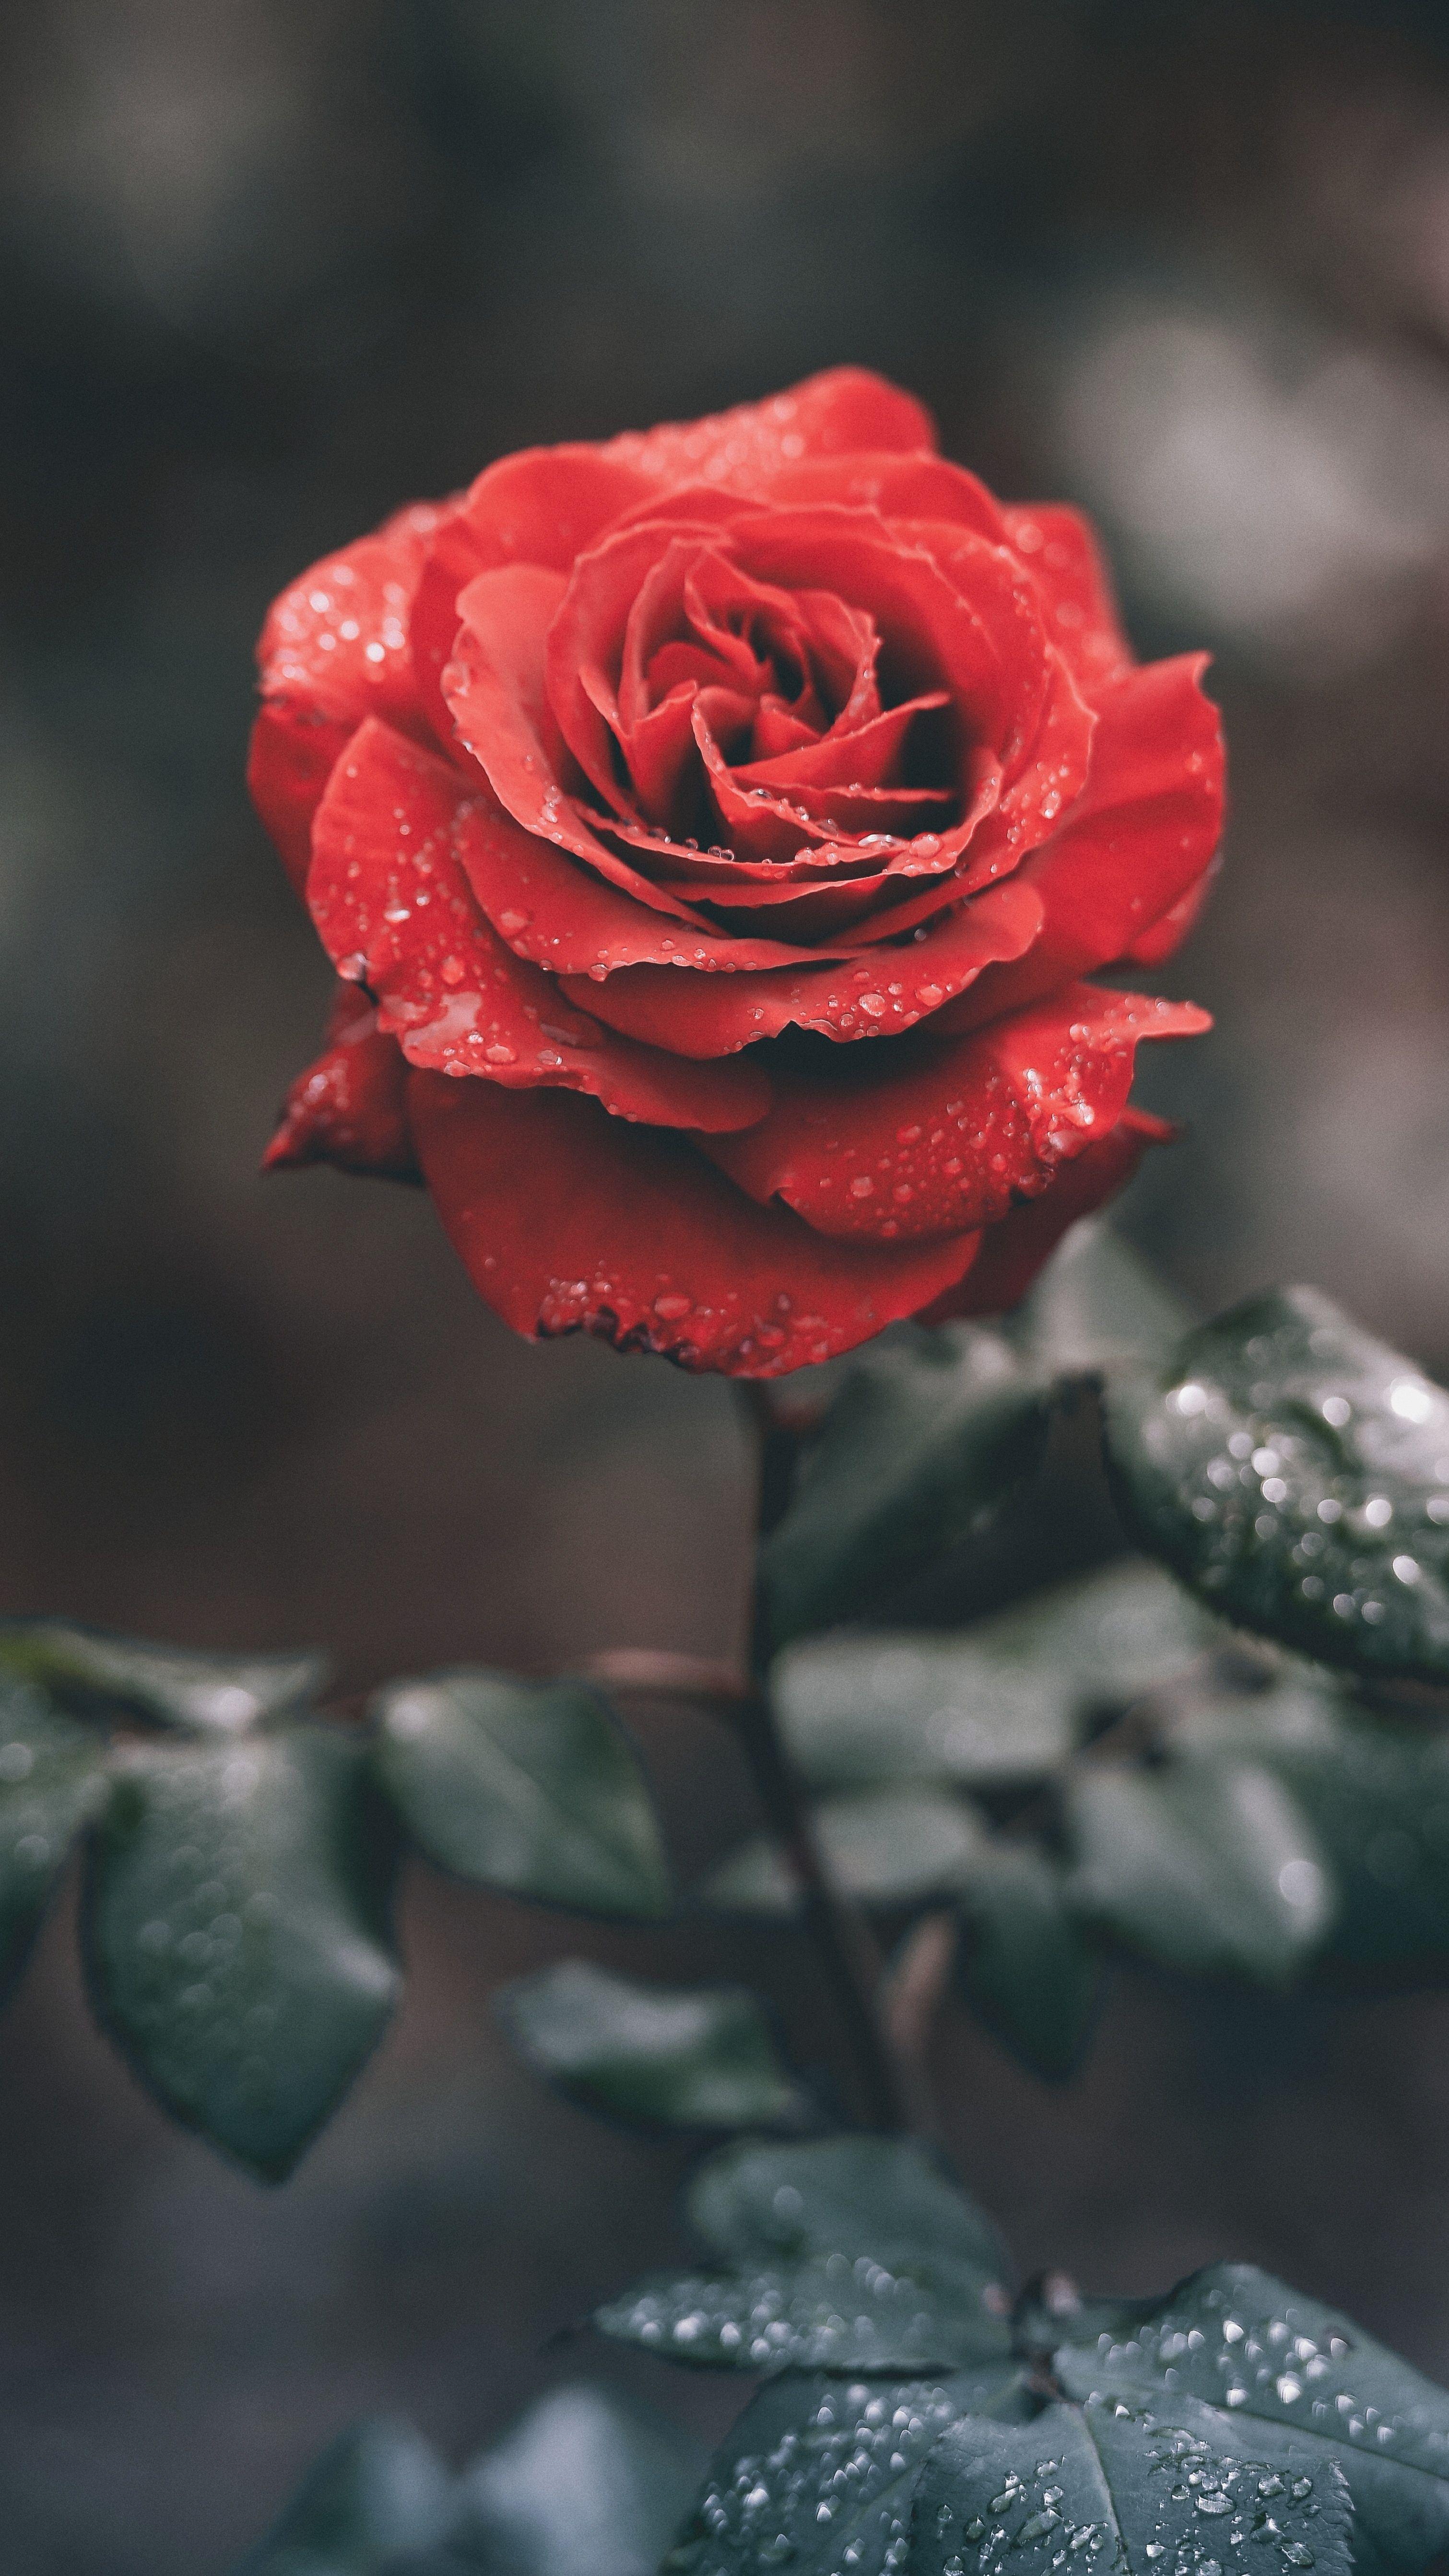 Download Wallpaper Mobile Red Rose - 203025a30d961b09db6a4edb17daa651  Collection_695846.jpg